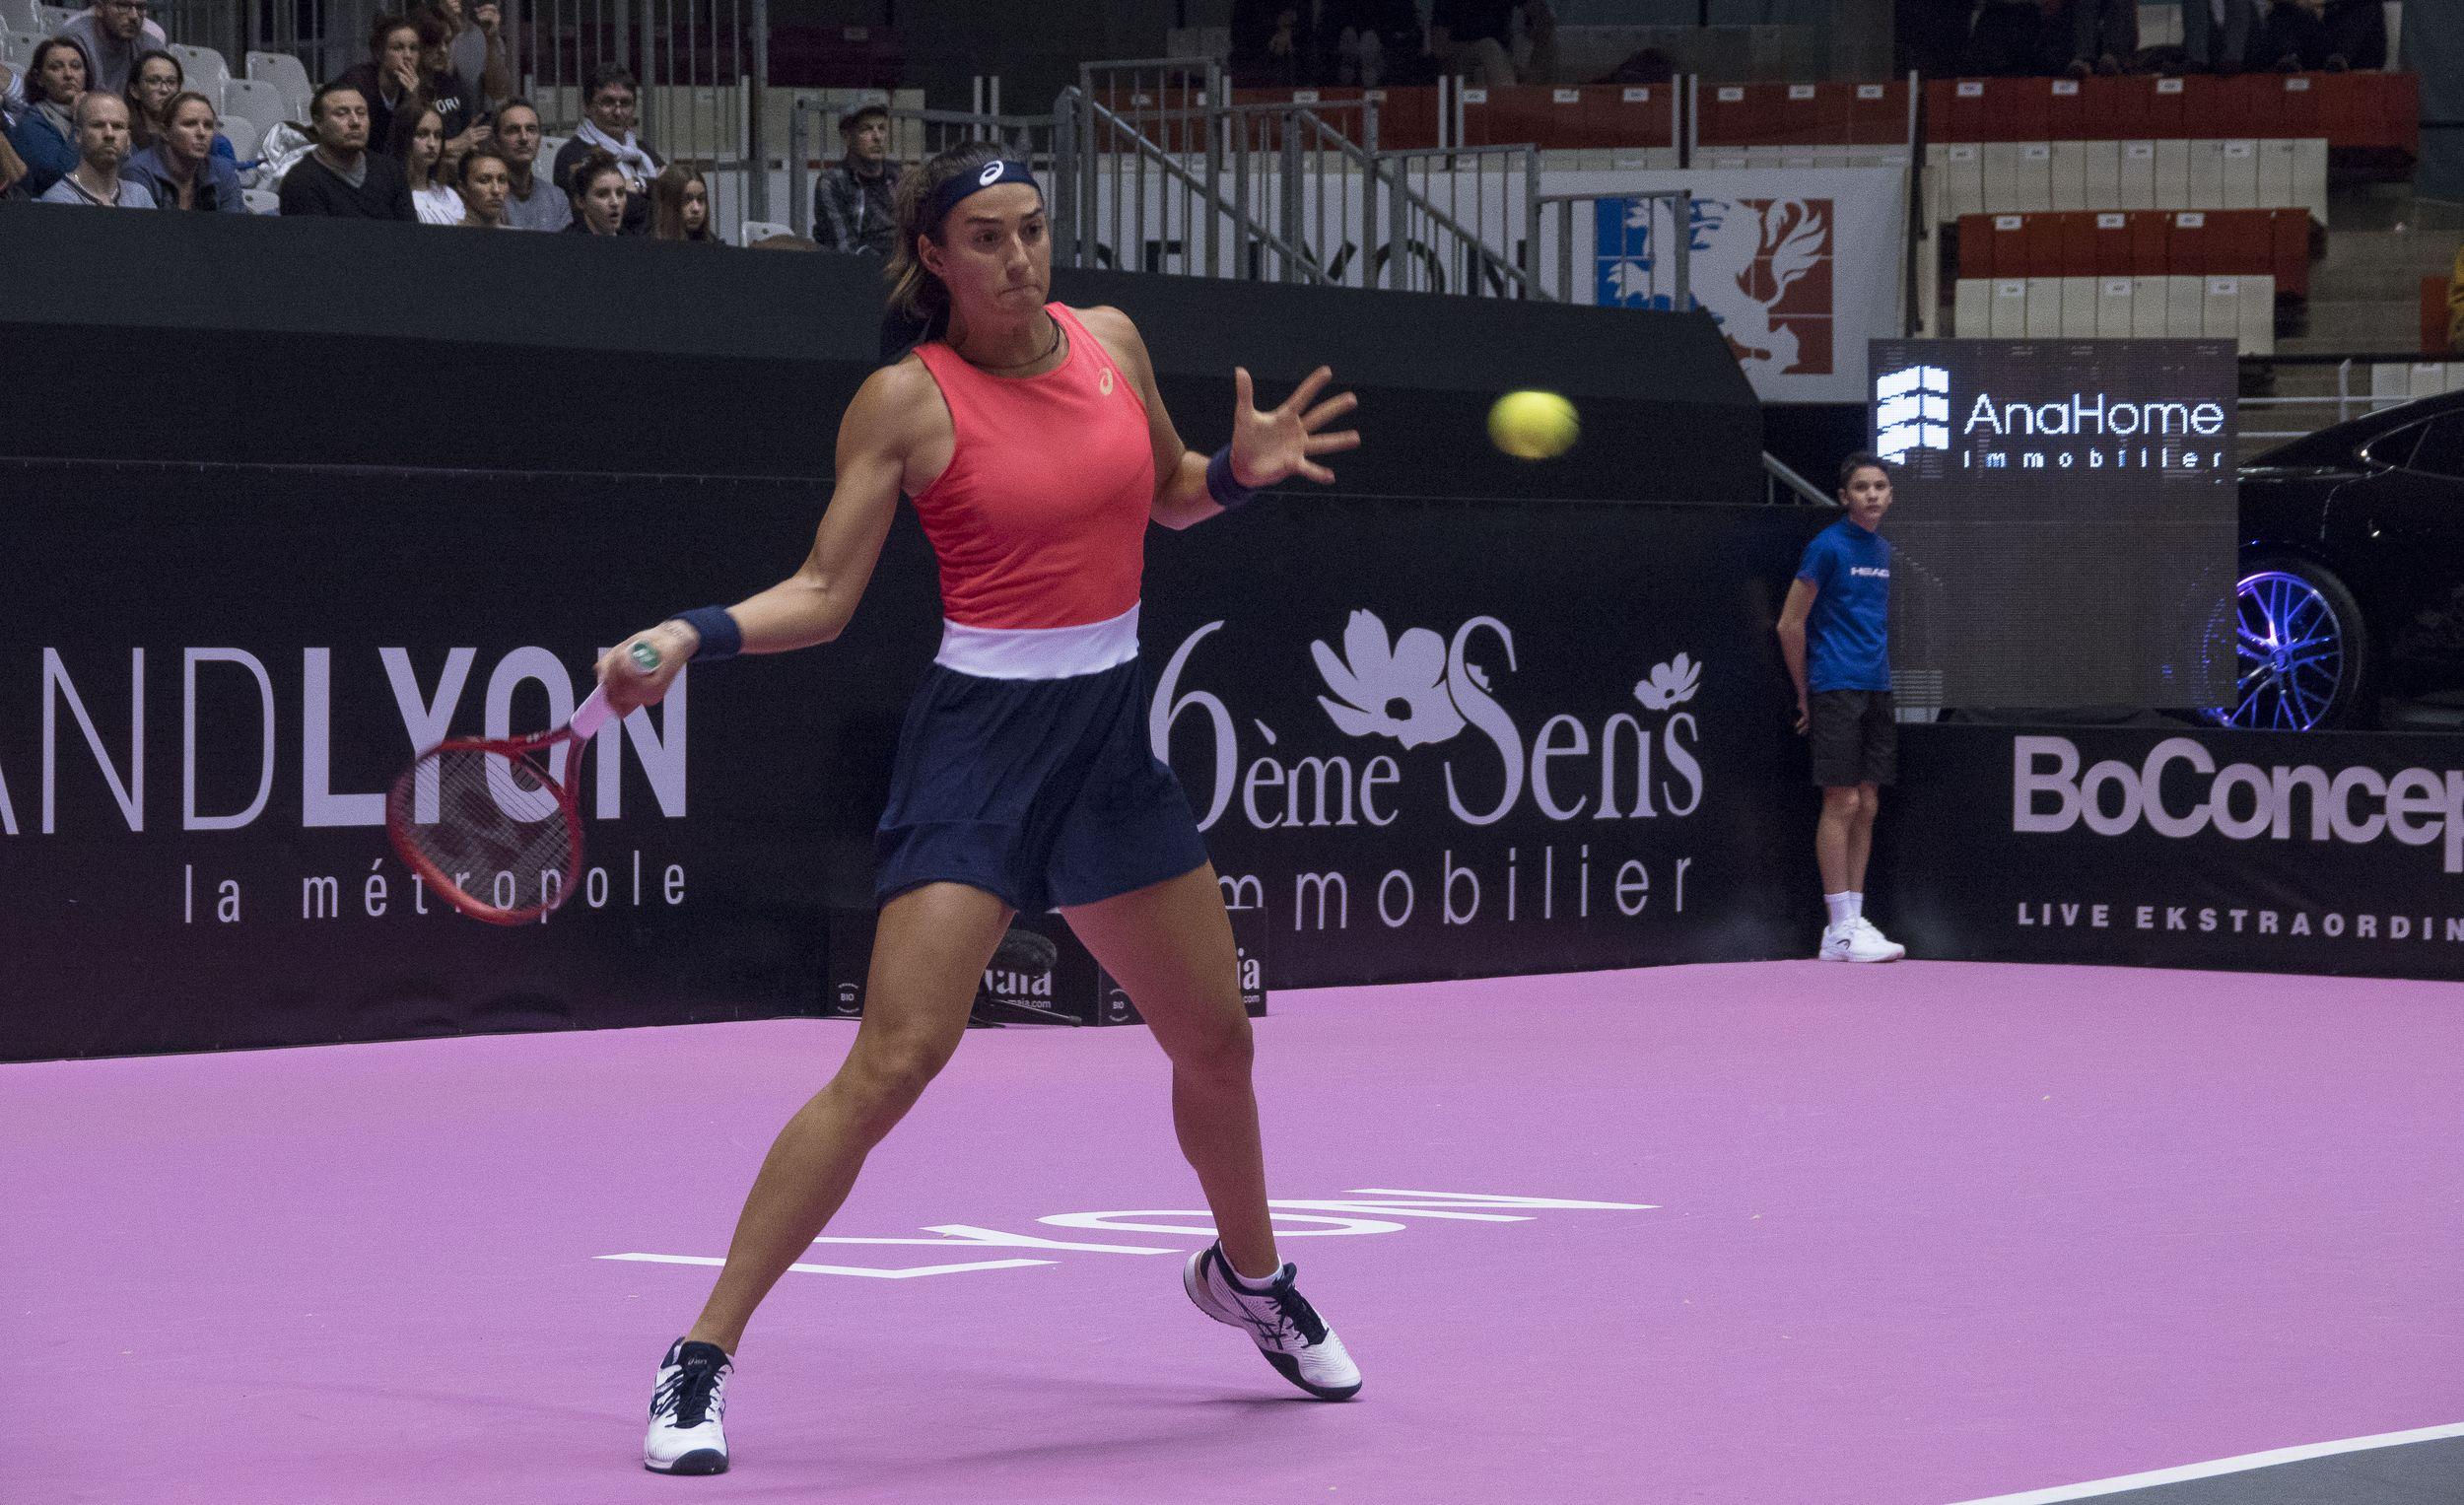 Tennis - WTA - Caroline Garcia prend sèchement la porte chez elle